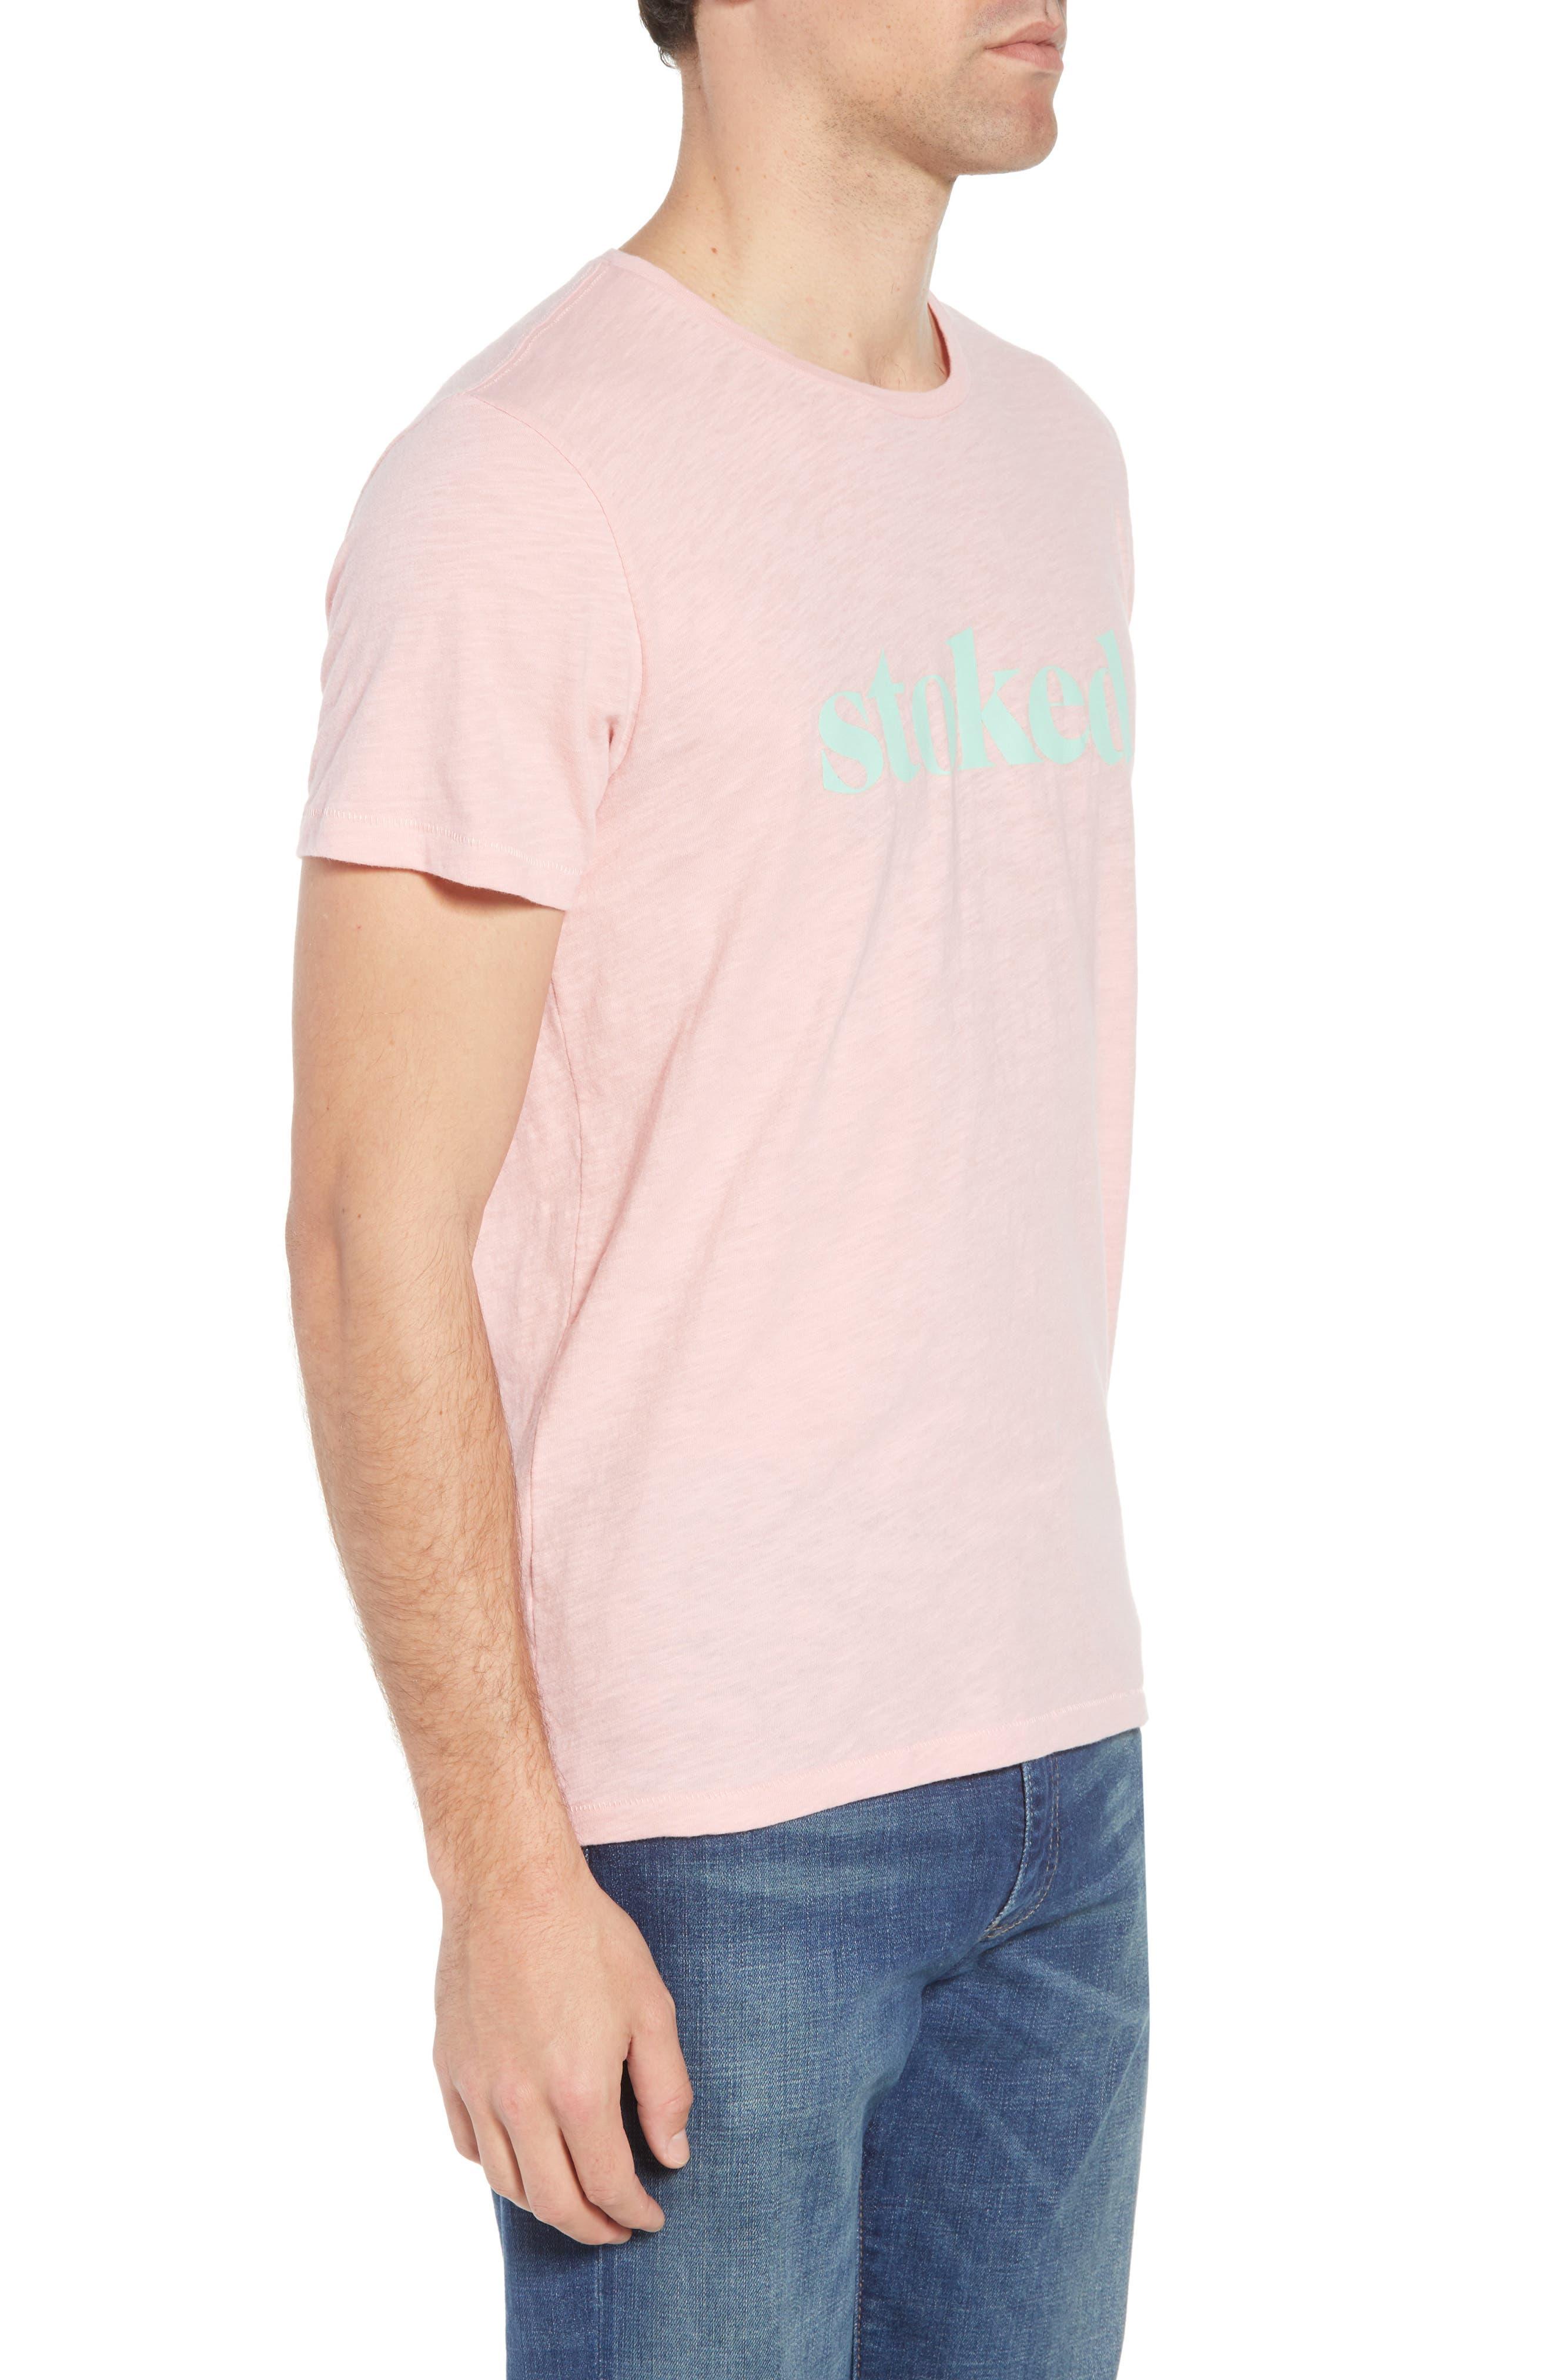 Stoked Slub T-Shirt,                             Alternate thumbnail 3, color,                             Pink Stoked